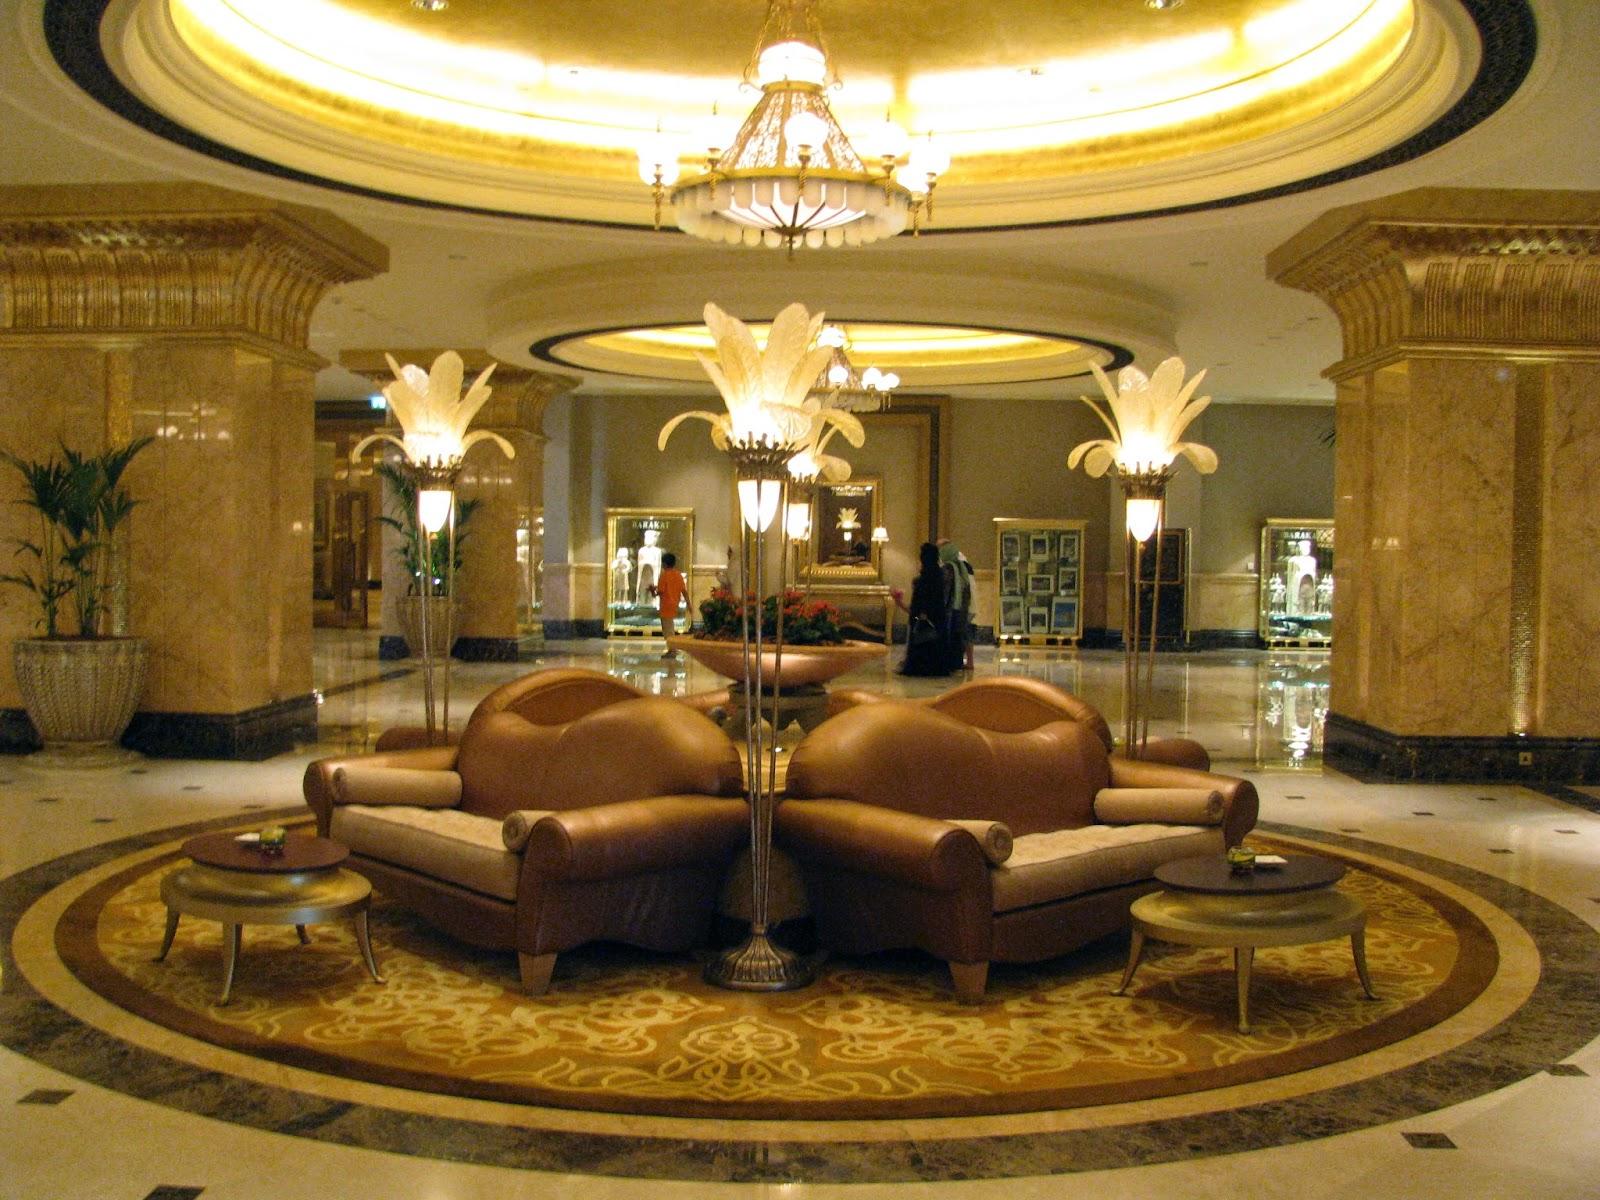 Ithaa Undersea Restaurant Prices Interiors Of Emirates Palace Abu Dhabi Interior Design